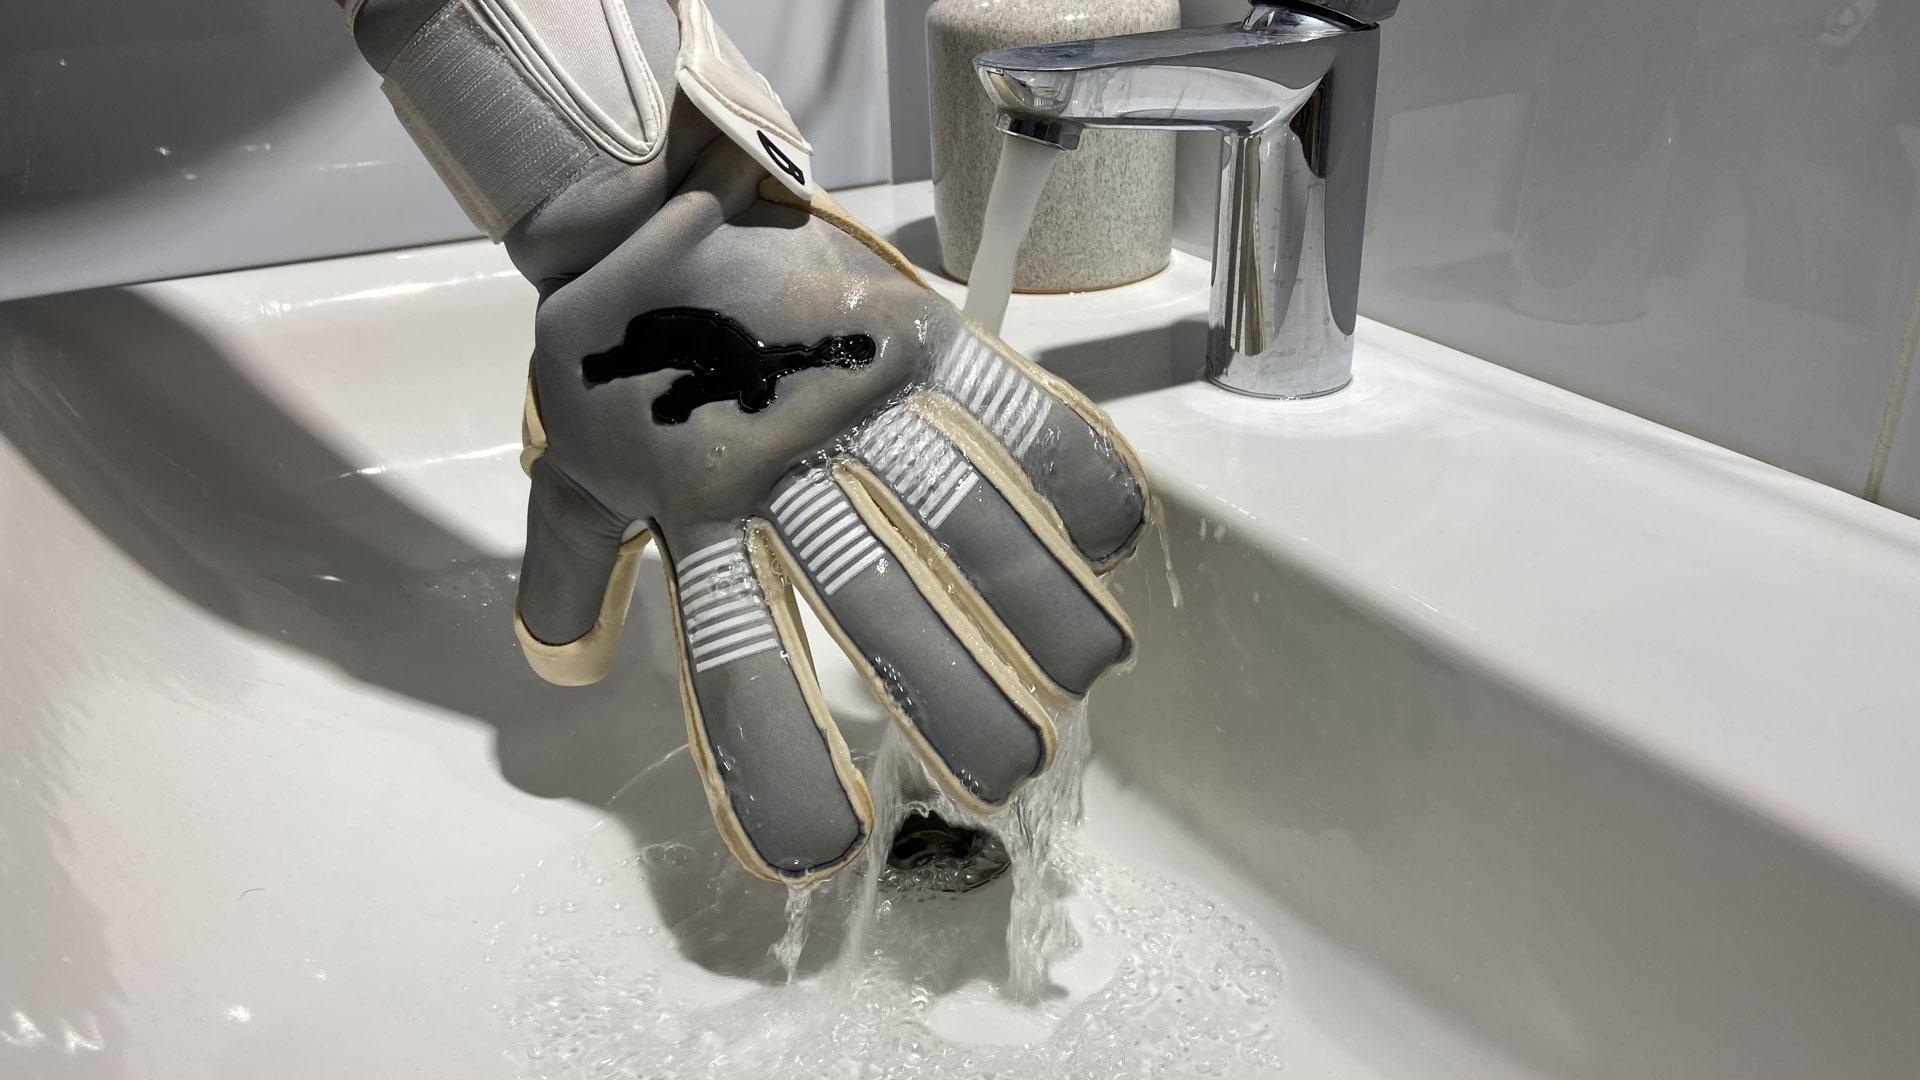 Brave GK Catalyst Grey засоби для захисту воротарських рукавиць-інтернет-магазин Brave GK